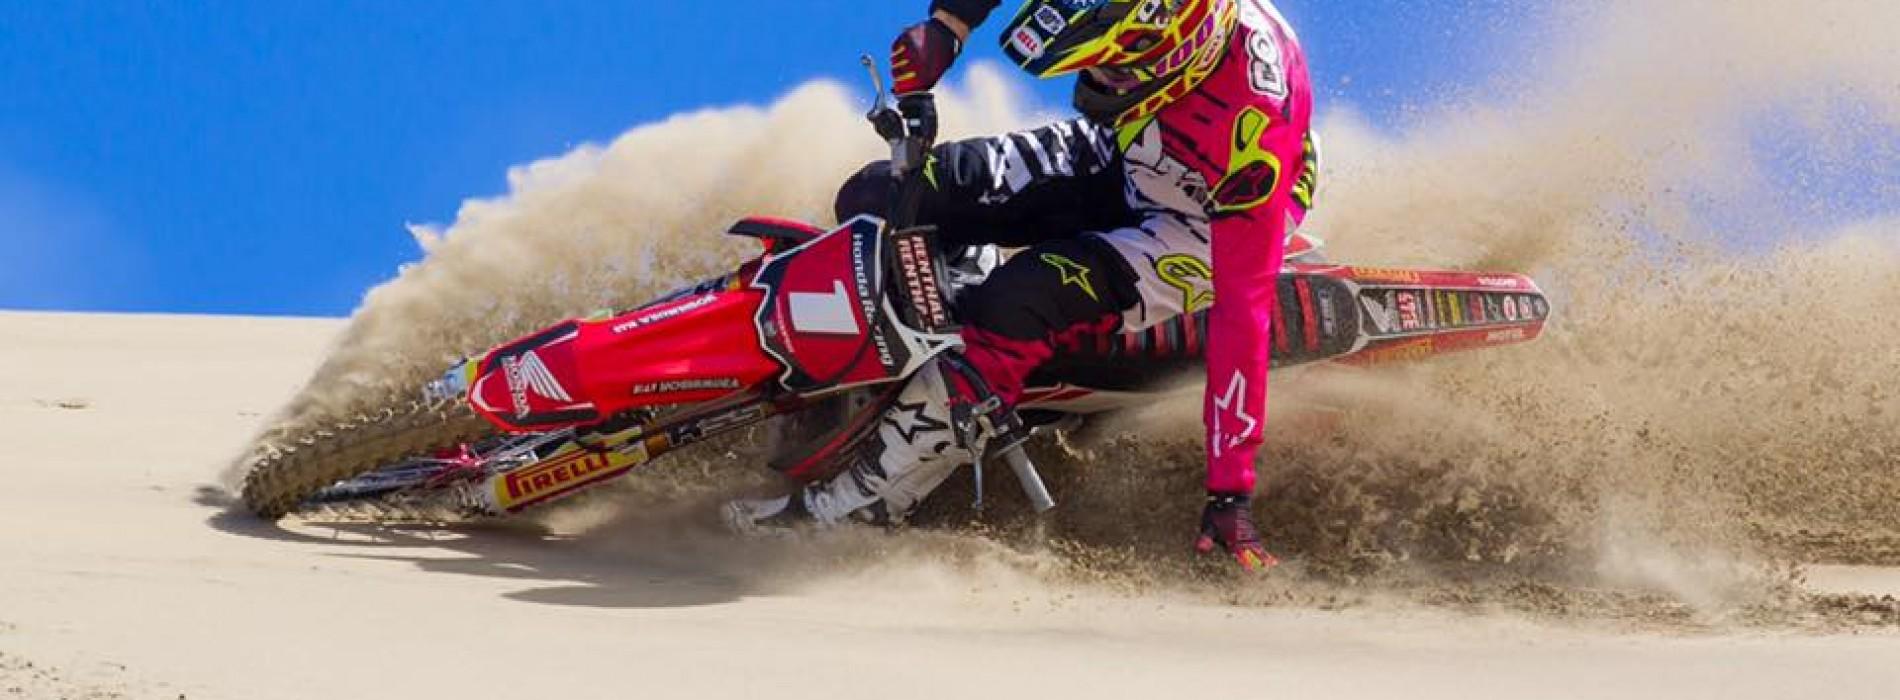 Motocross- Top Billing on TV?